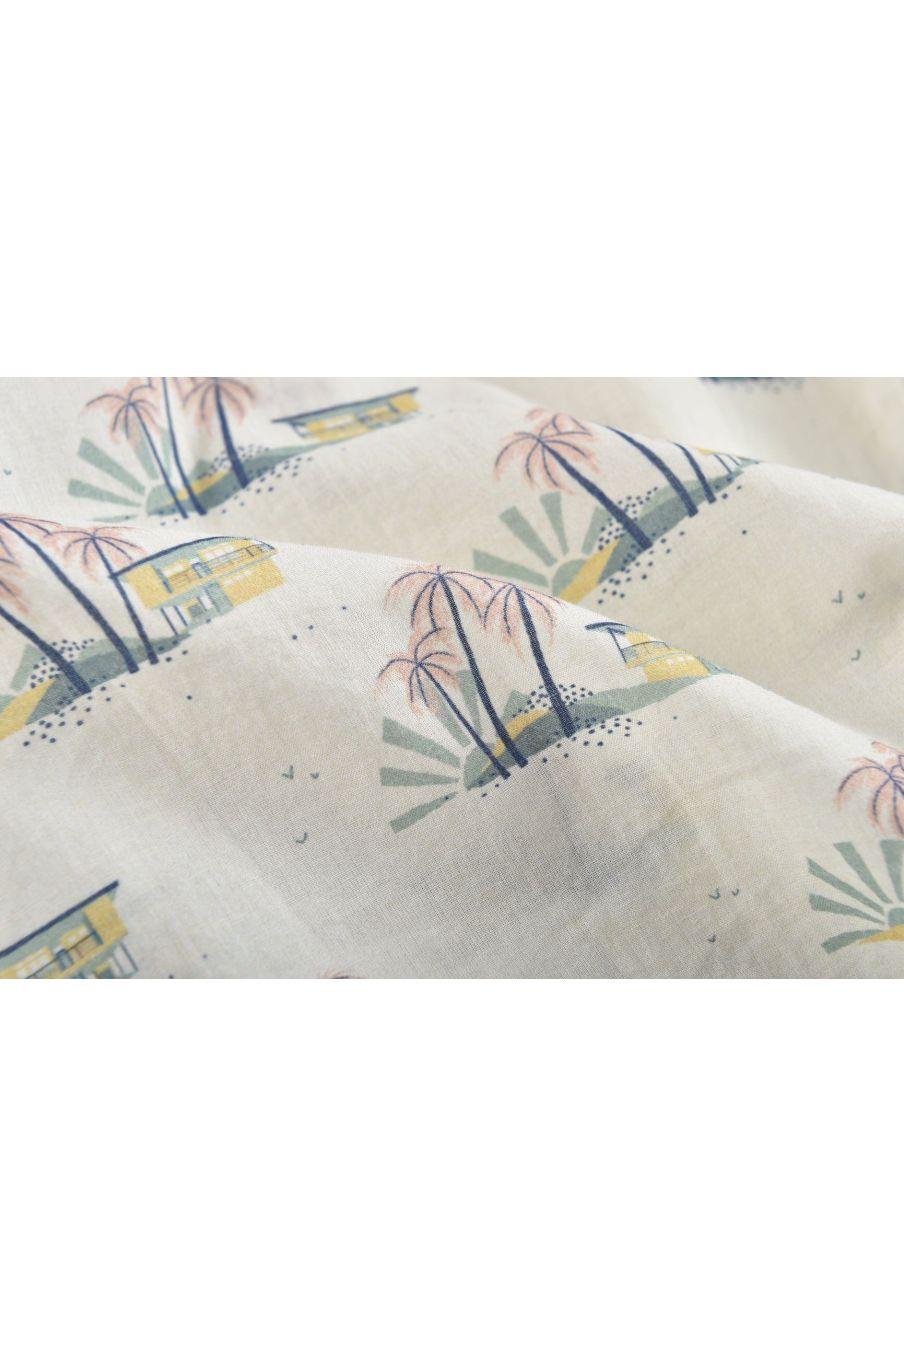 boheme chic vintage chemise garcon alov off-white hawaï